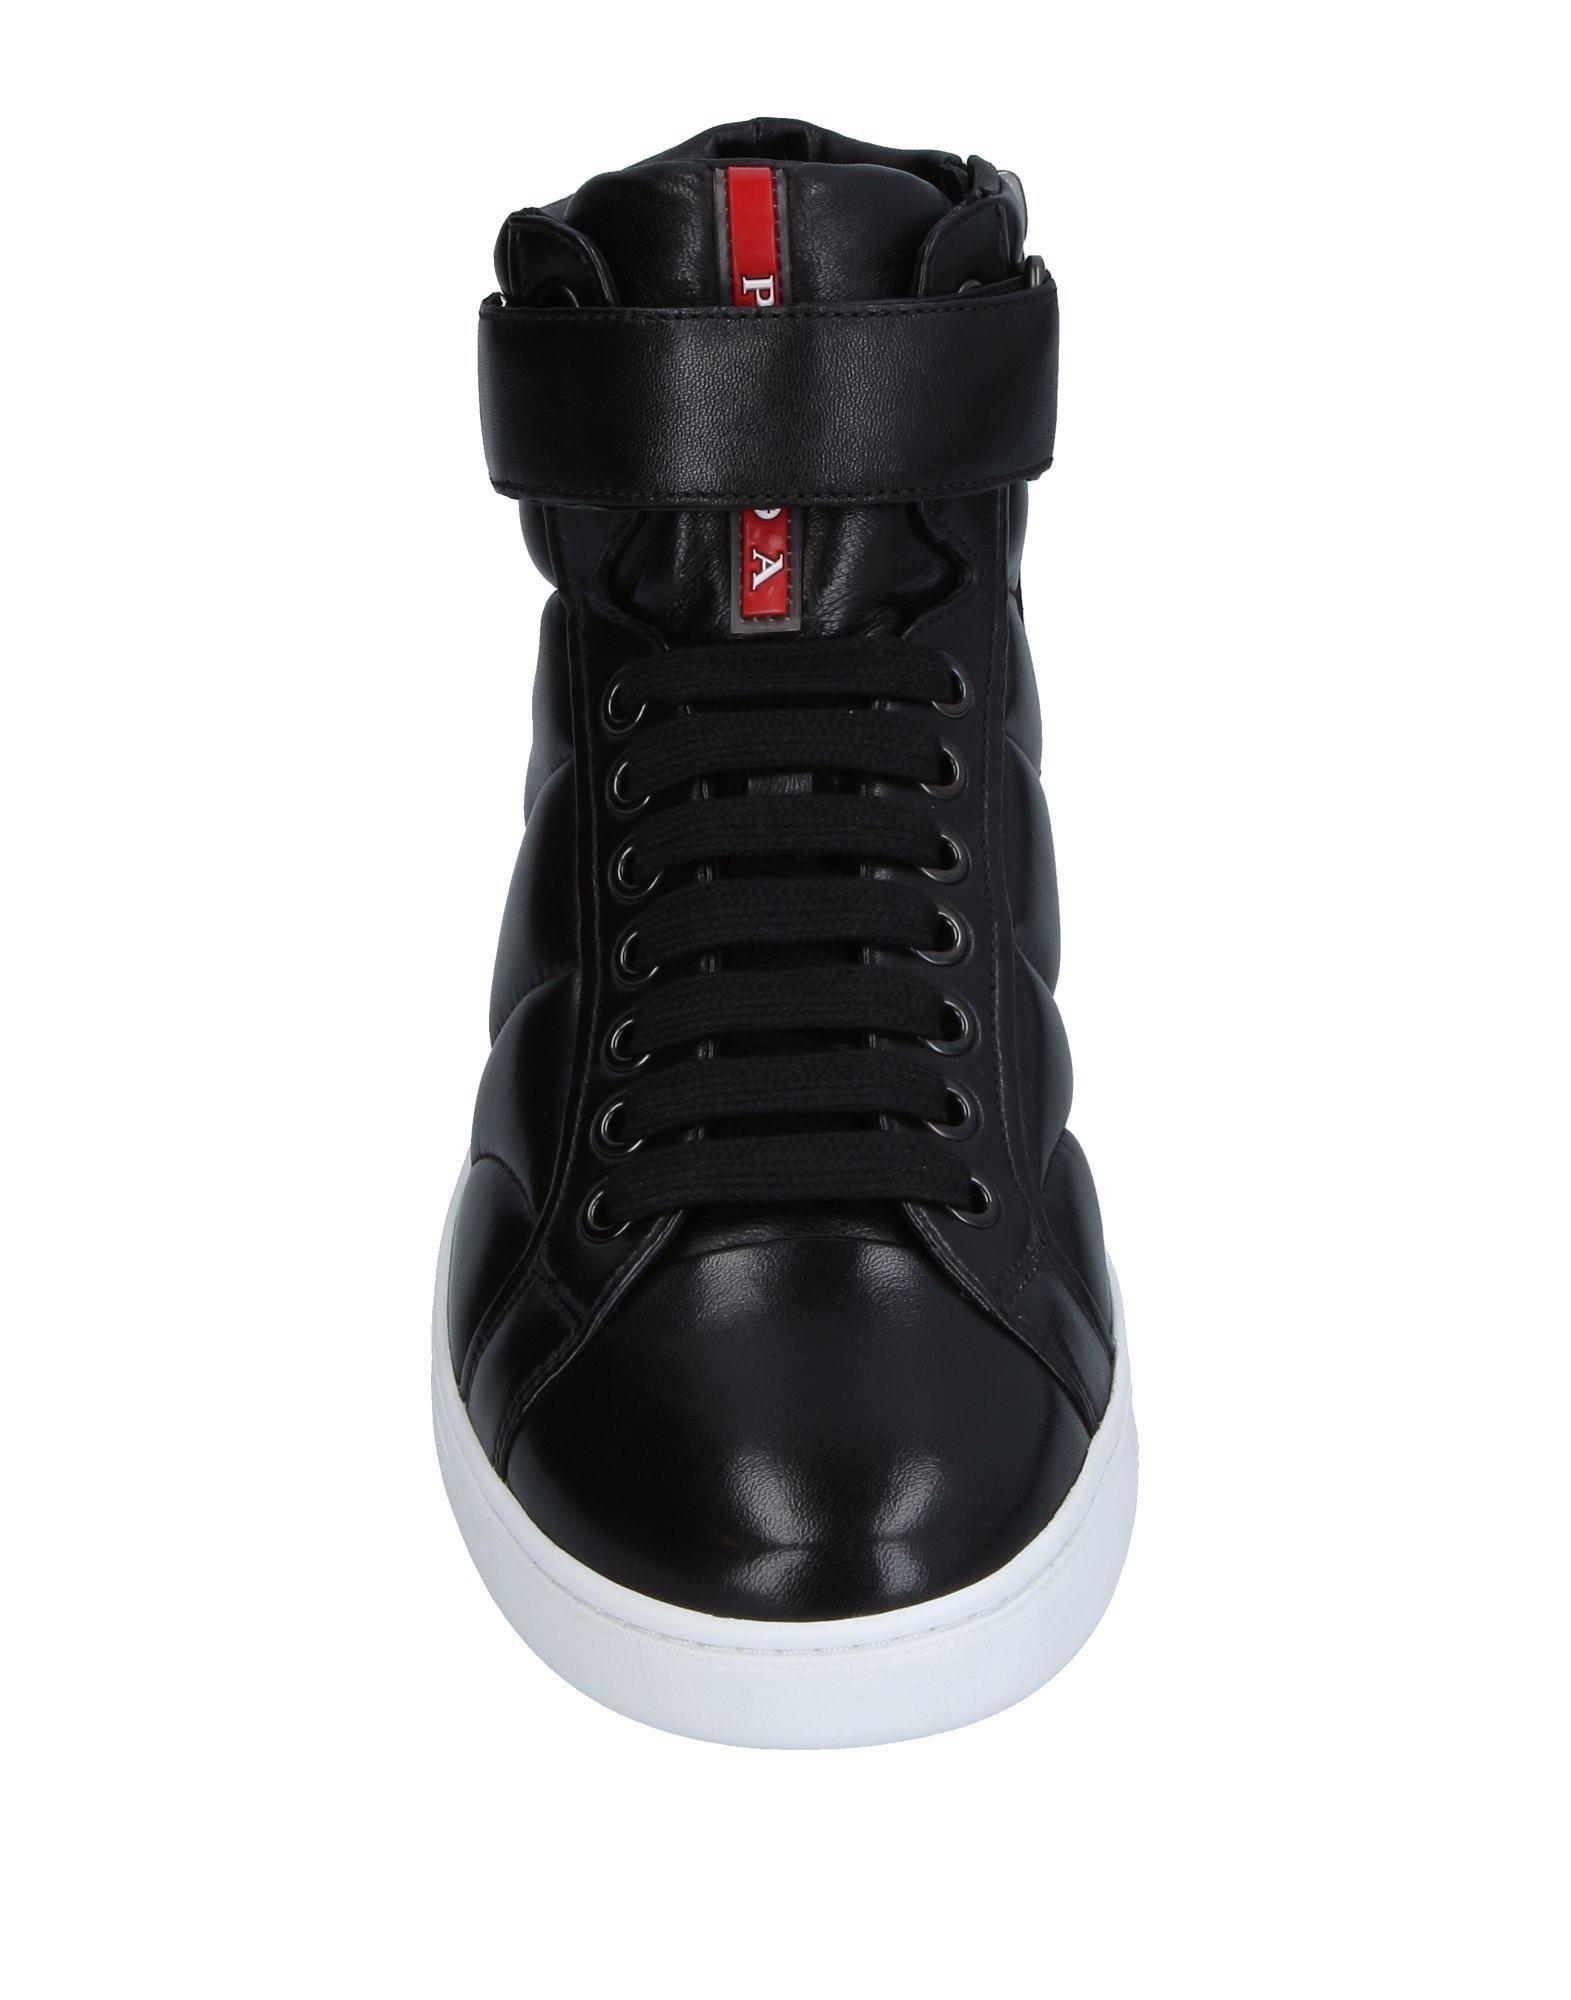 Prada Linea Rossa Leather High-tops & Sneakers in Black for Men